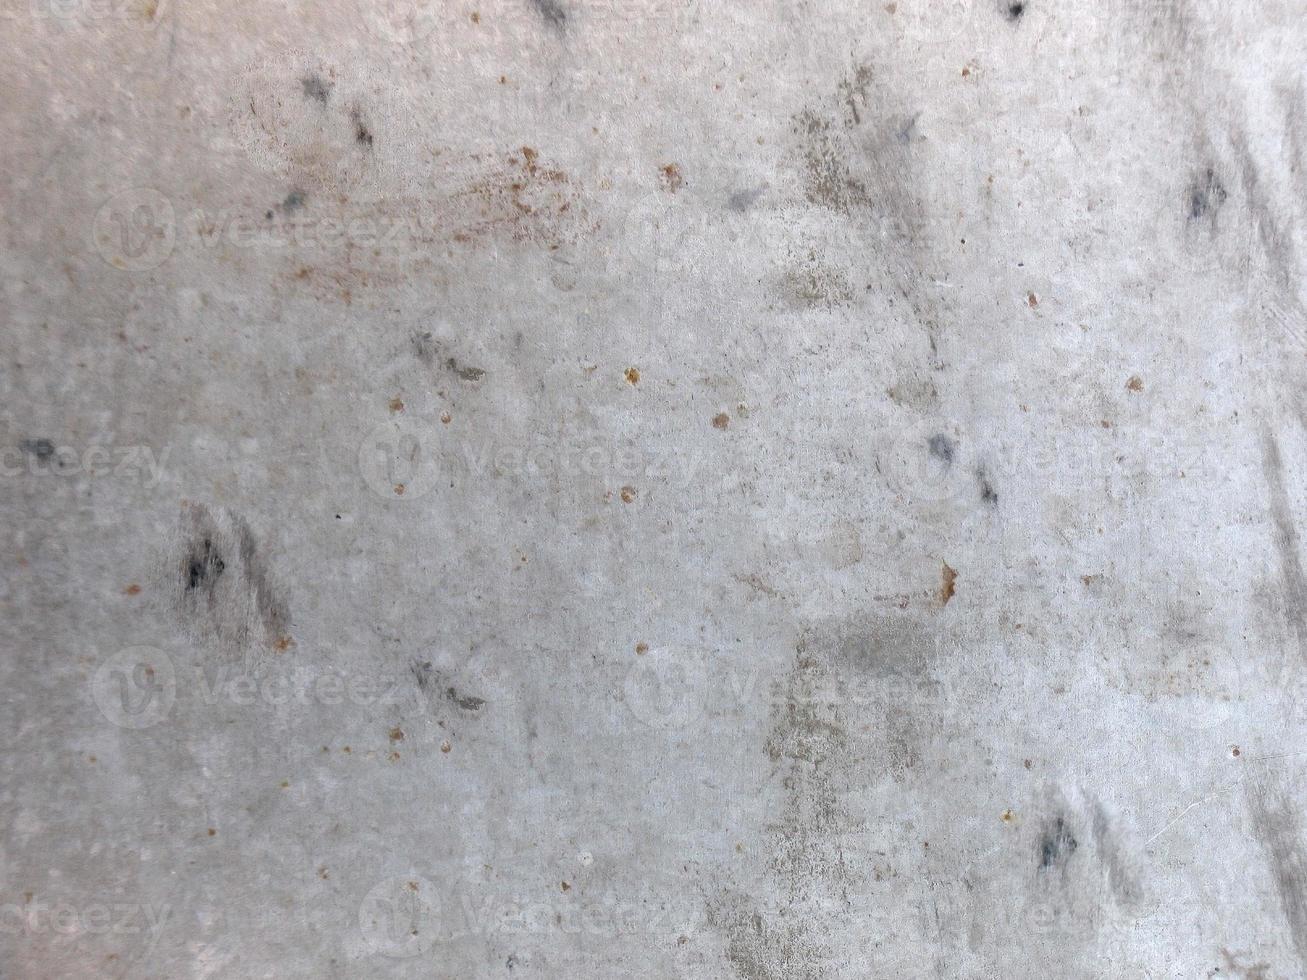 textura de parede, fundo grunge foto